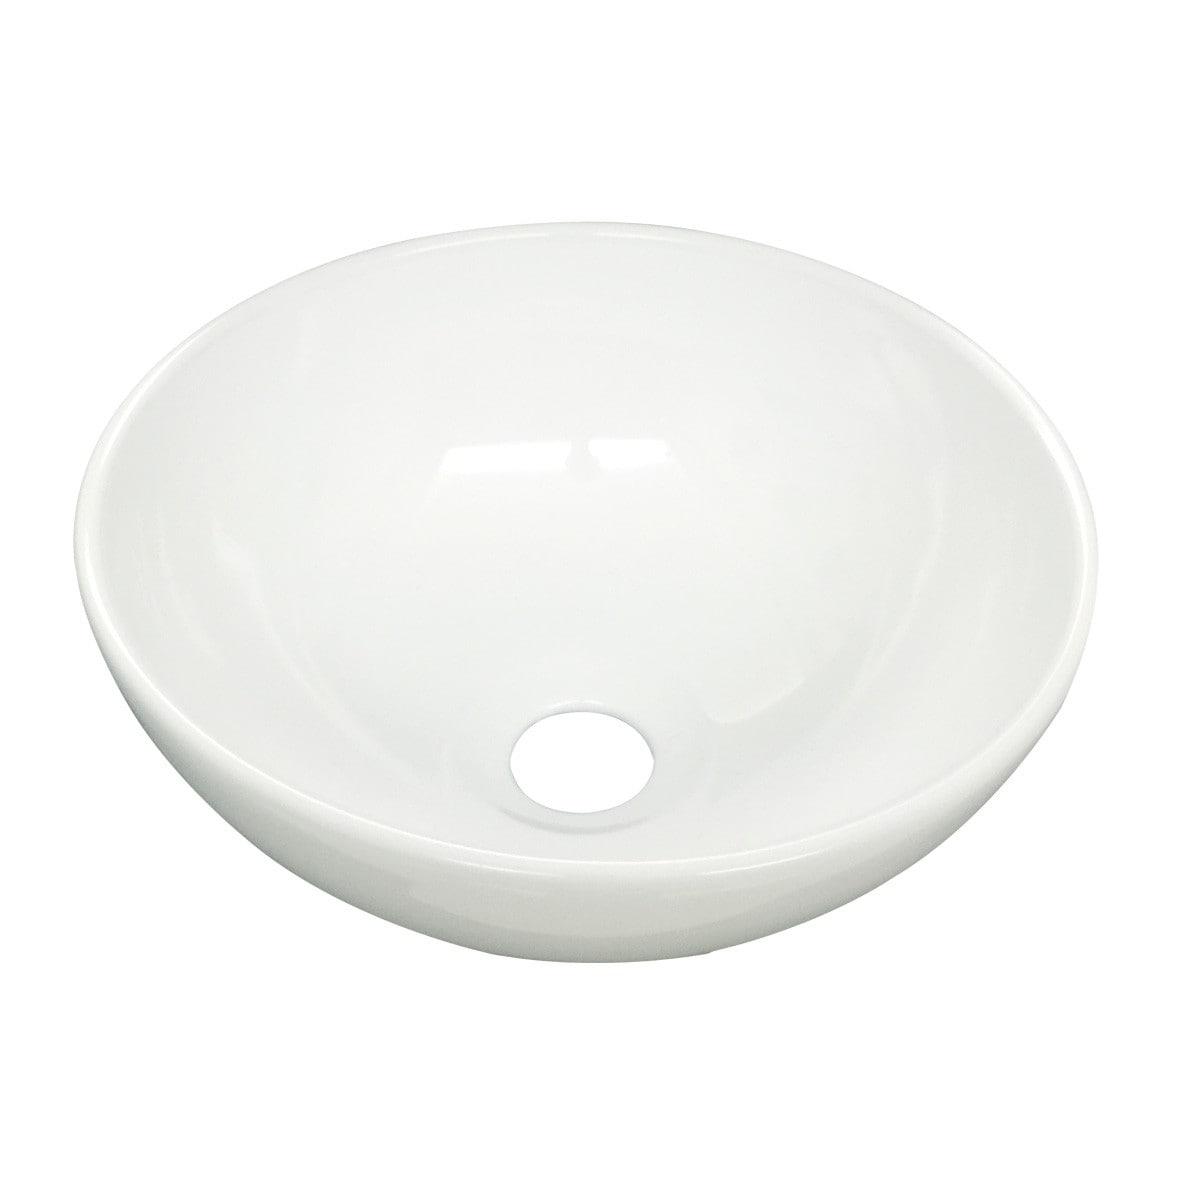 Round Countertop Bathroom